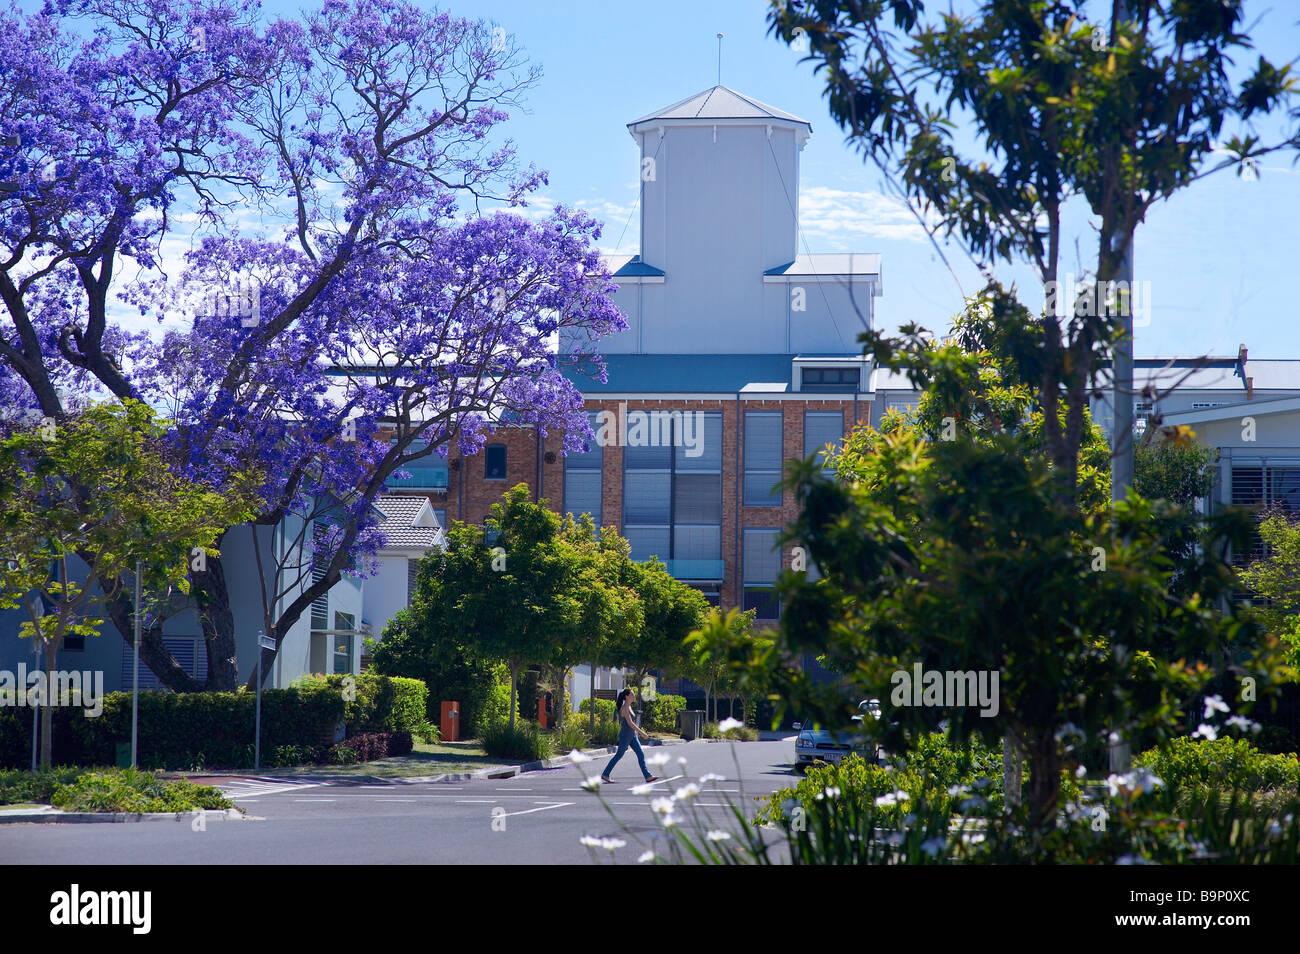 Zucker-Raffinerie-Apartments-Brisbane-Australien Stockbild